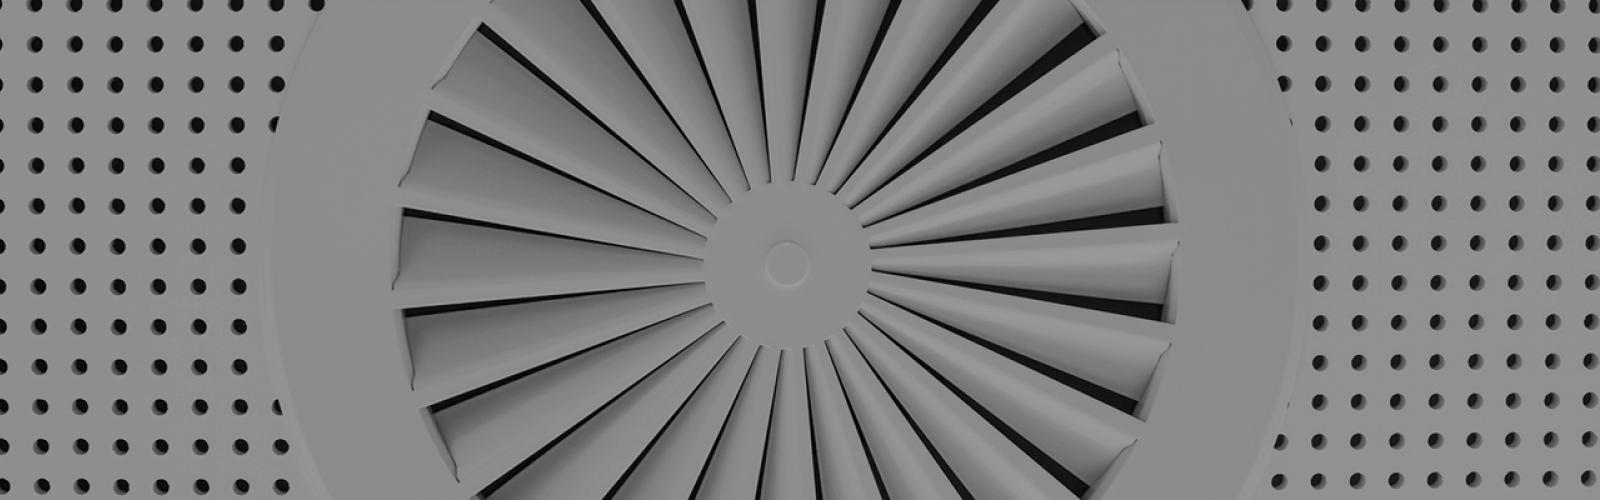 HVAC | Accurate Perforating